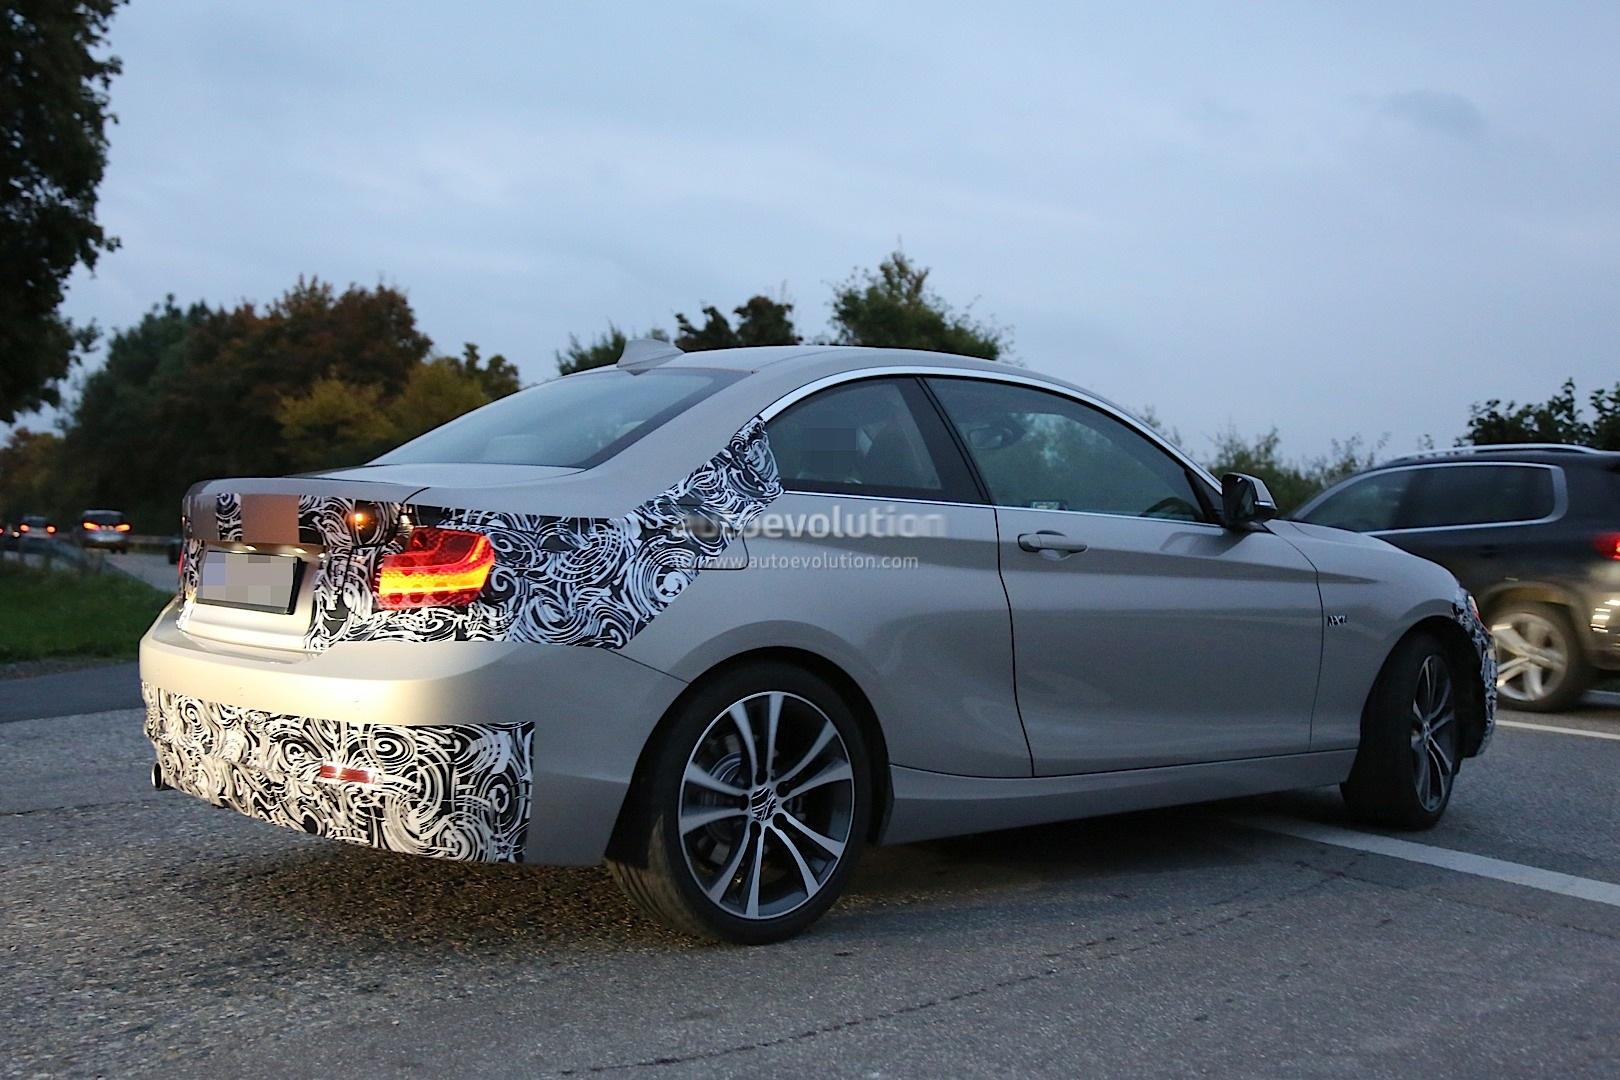 Spyshots: BMW F22 2 Series Coupe Almost Undisguised - autoevolution